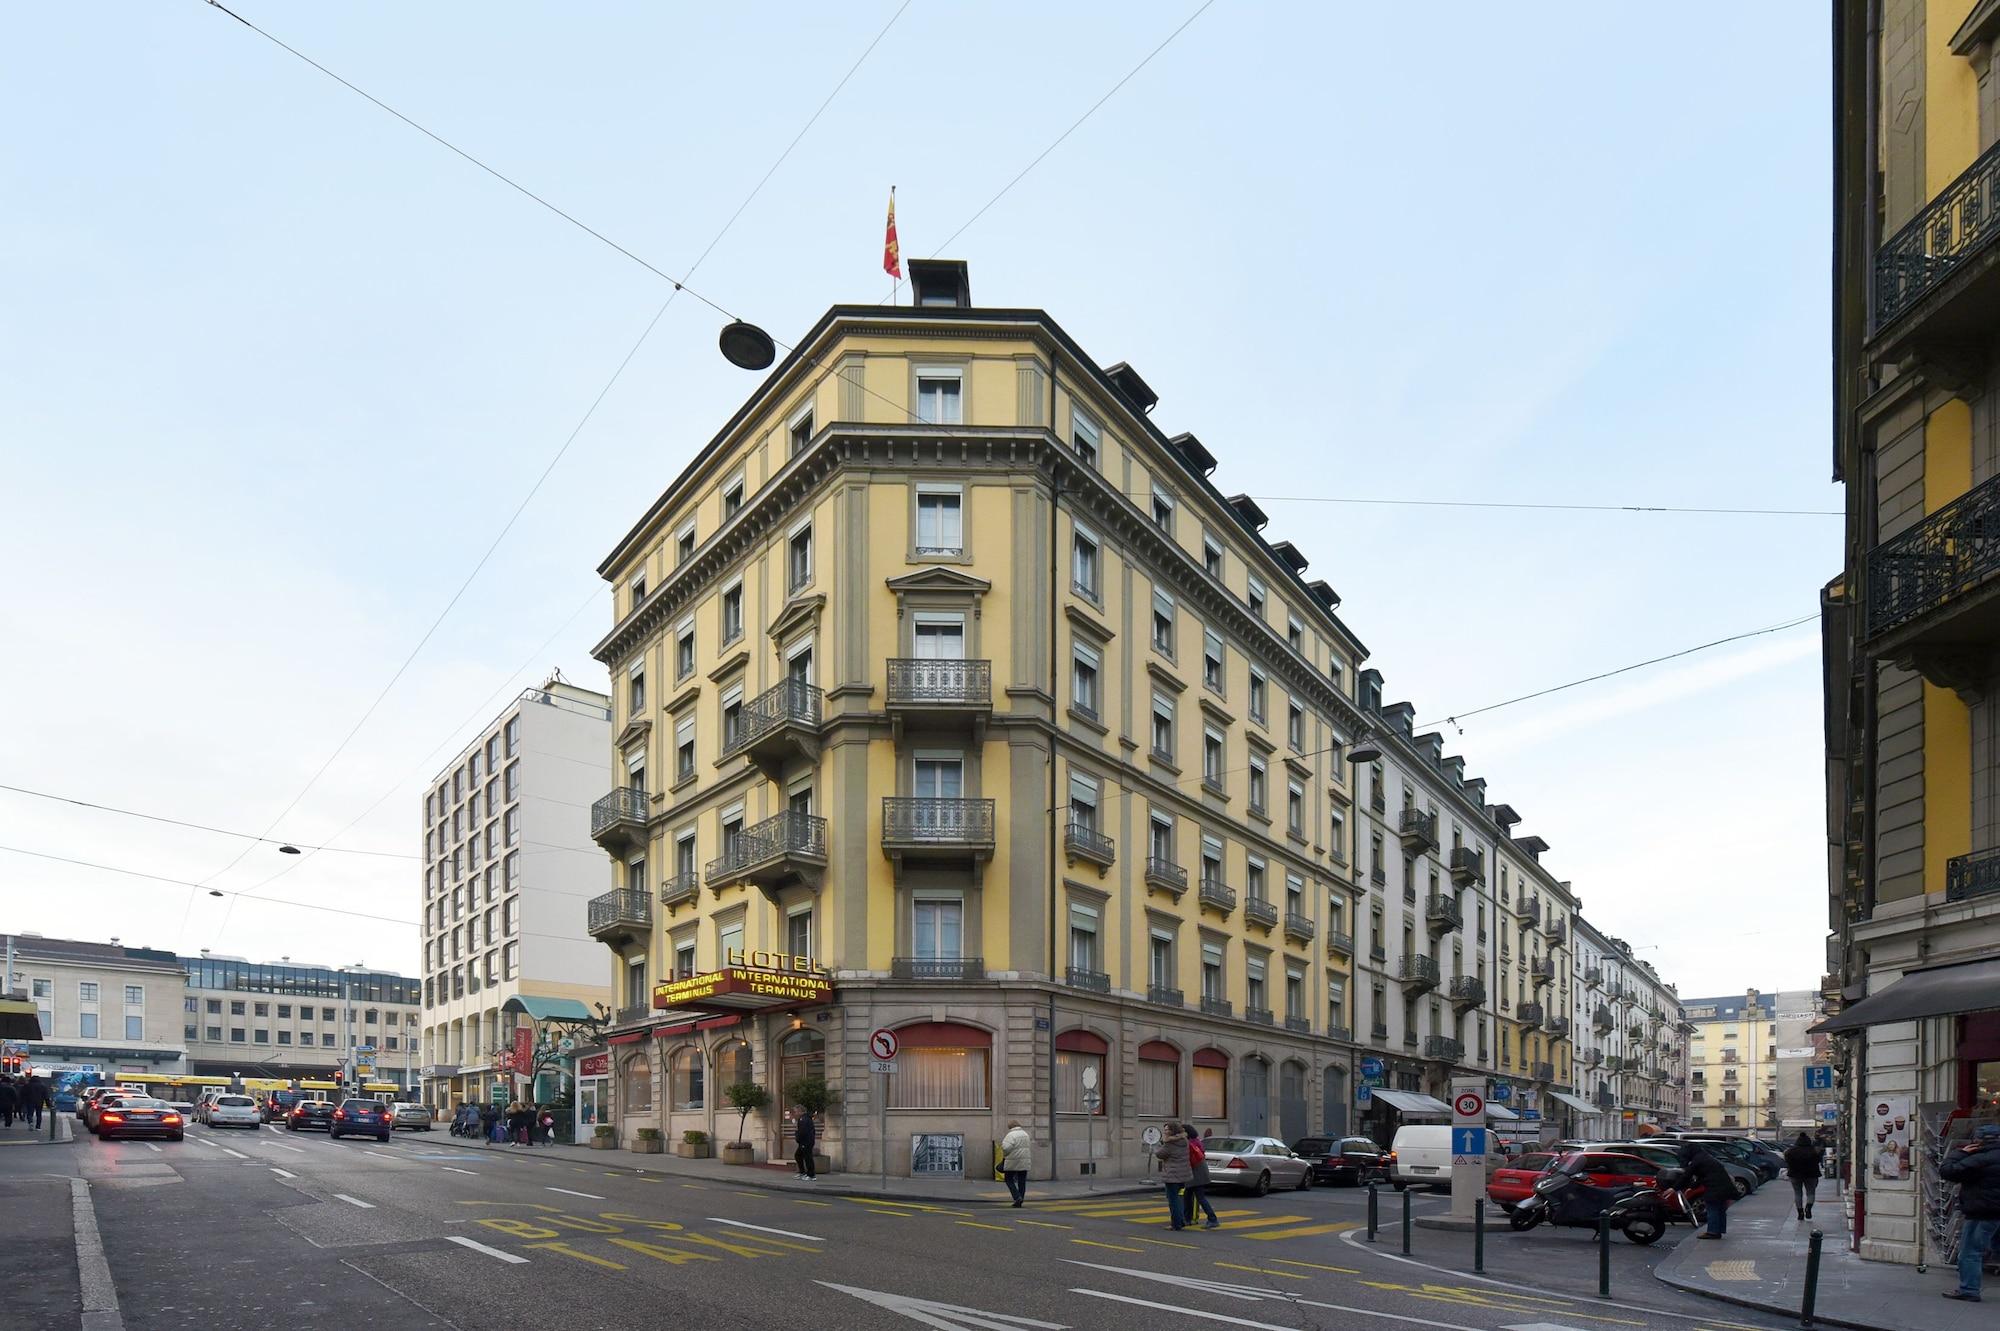 Hôtel International & Terminus, Genève